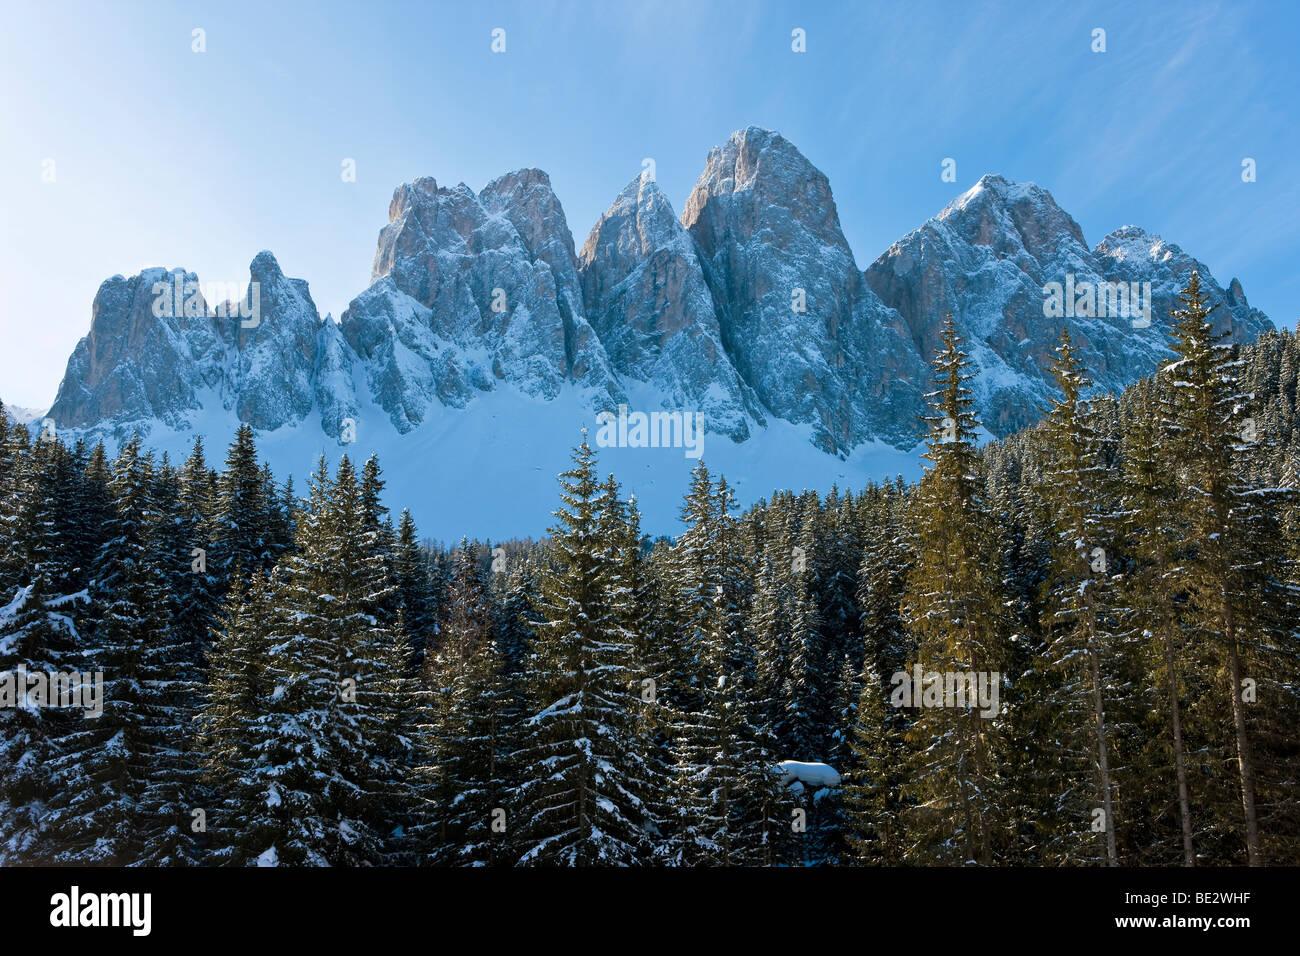 Paisaje invernal, Le Odle Grupo/Geisler Spitzen, Val di Funes, montañas Dolomitas italianas, Trentino-Alto Imagen De Stock